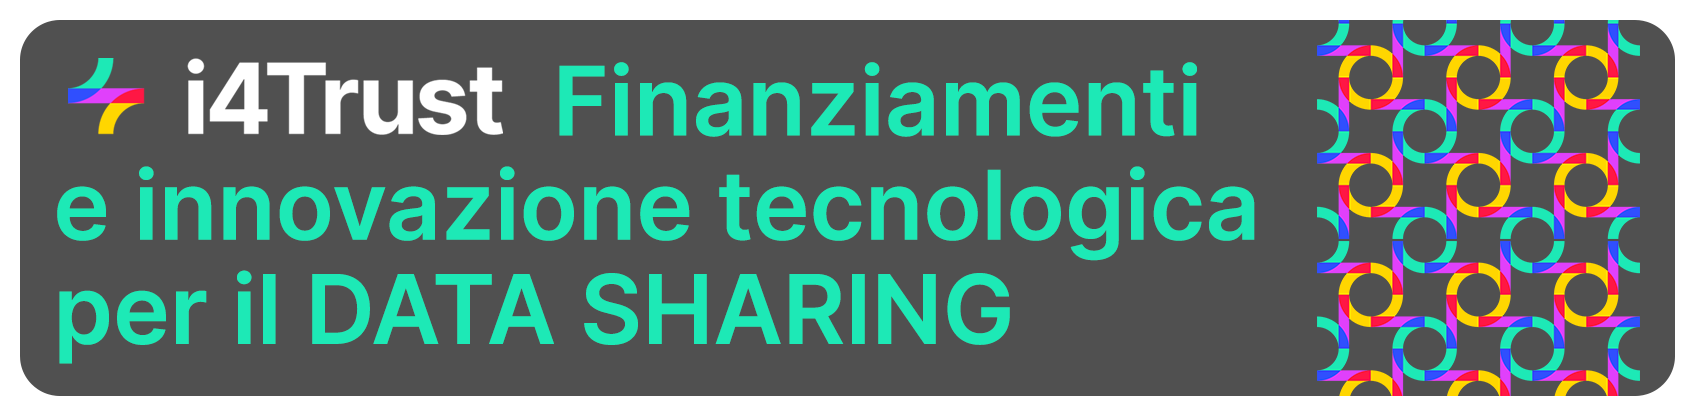 https://fiwareinnova.org/finanziamenti-data-sharing/